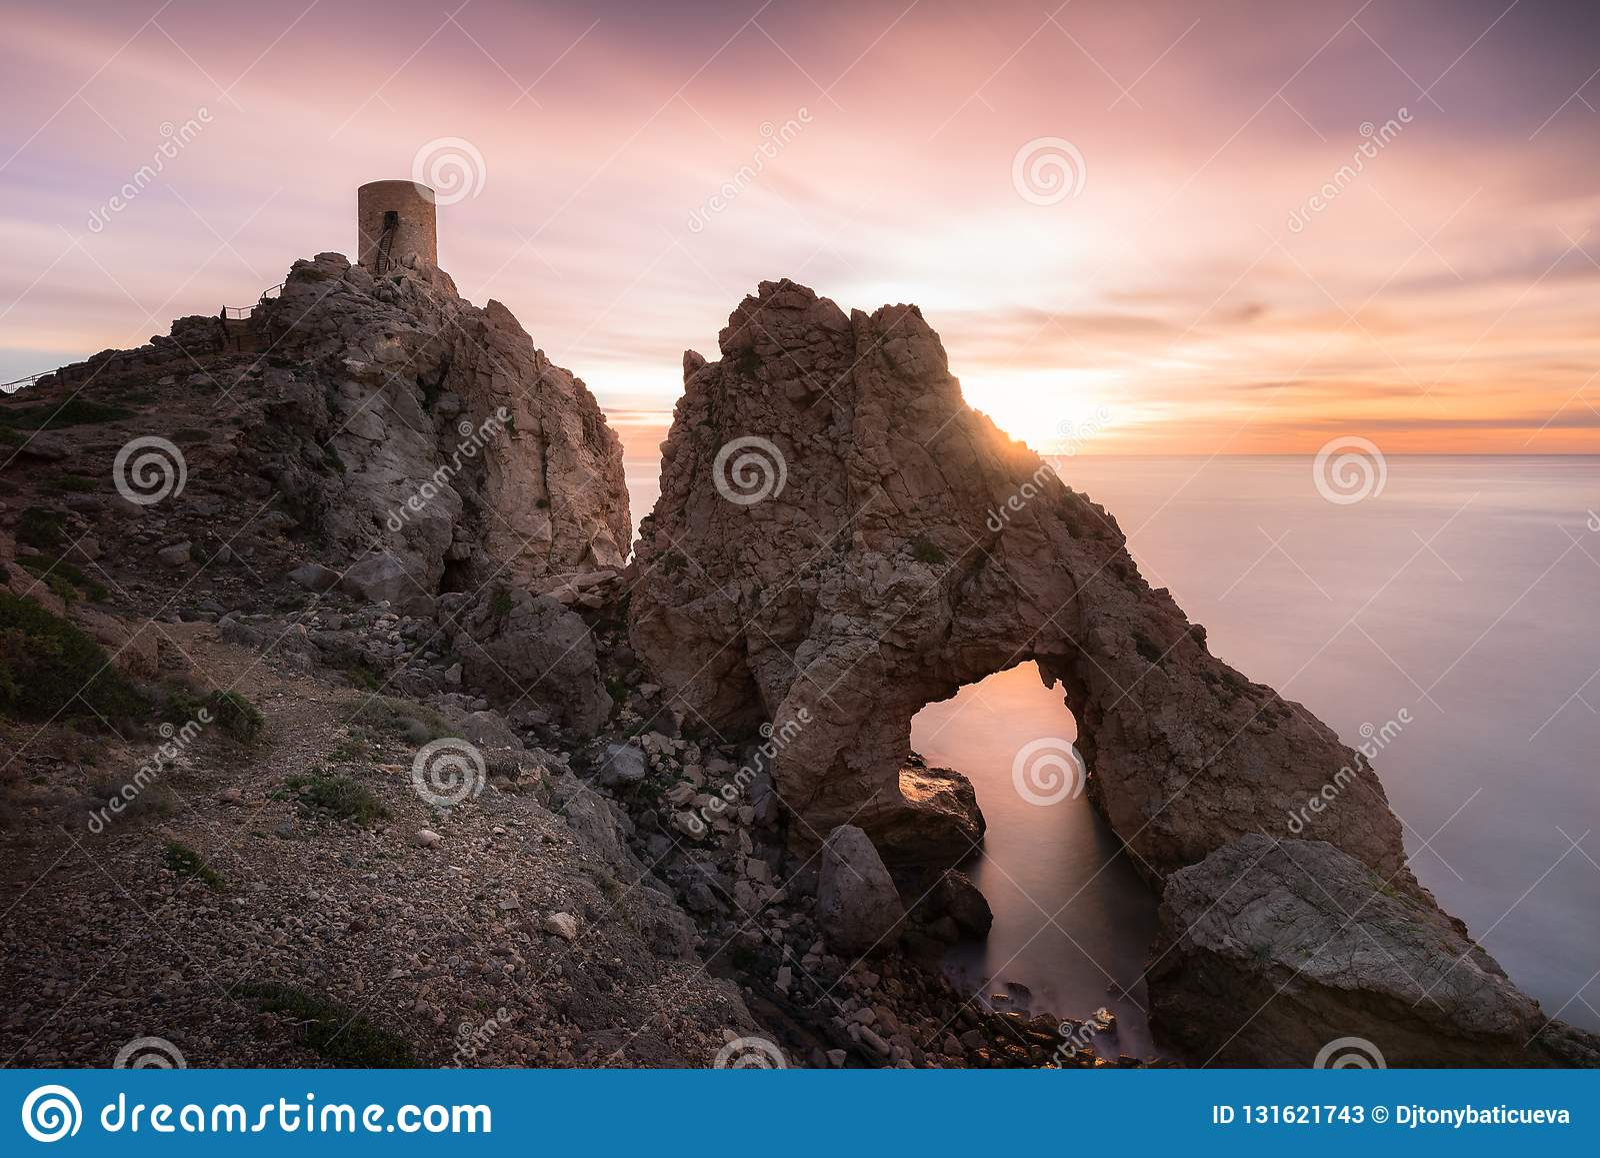 Torre del Pirulico, Atalaya del Peñà ³ n of Torre DE los Diablos zijn watchtower of kustdiewatchtower in wordt gevestigd